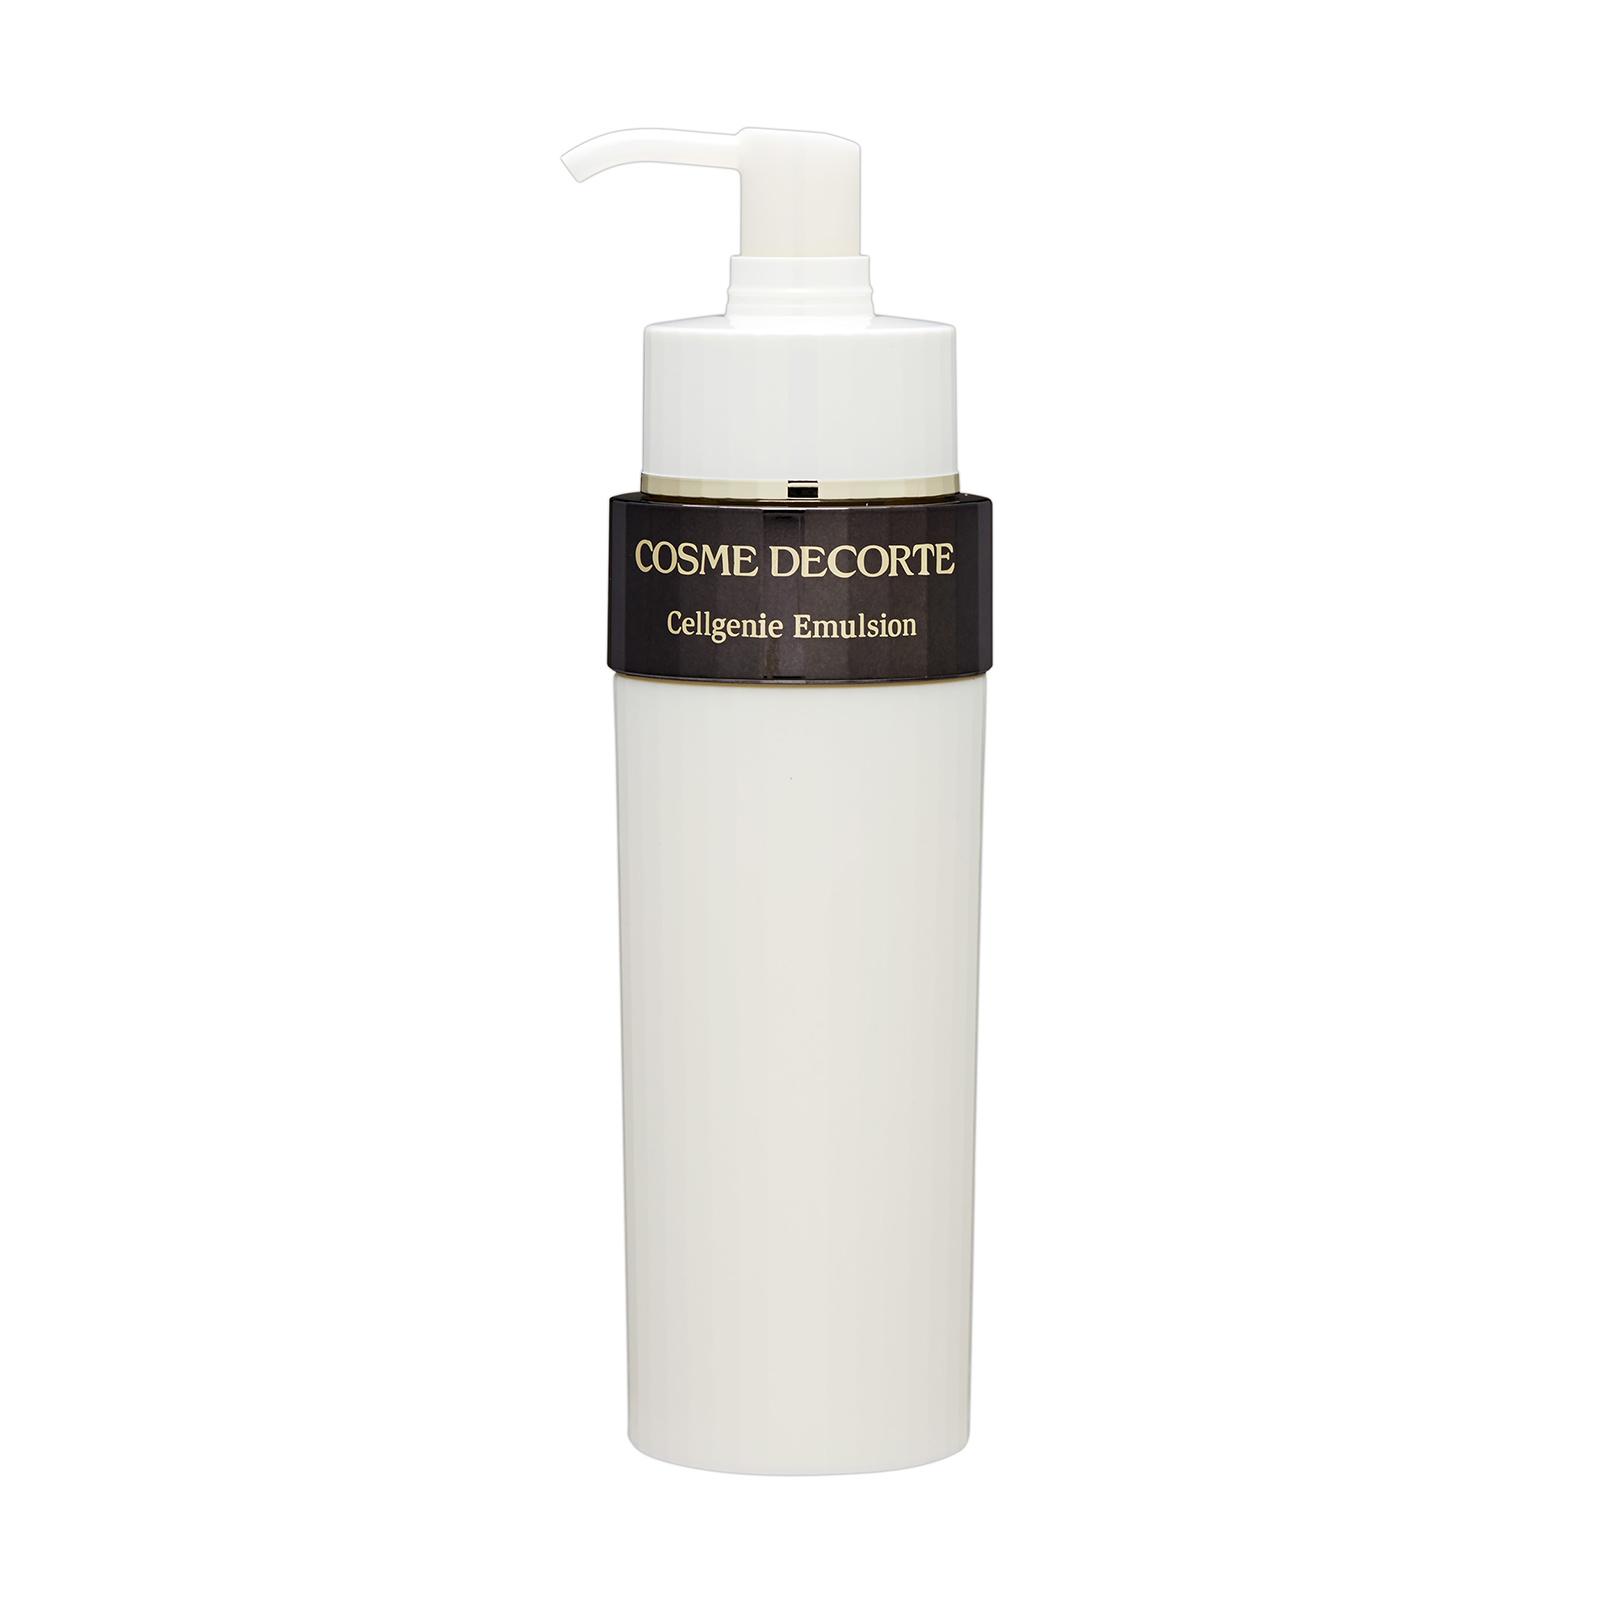 COSME DECORTE Cellgenie Emulsion 时光活氧柔肤乳 200ml